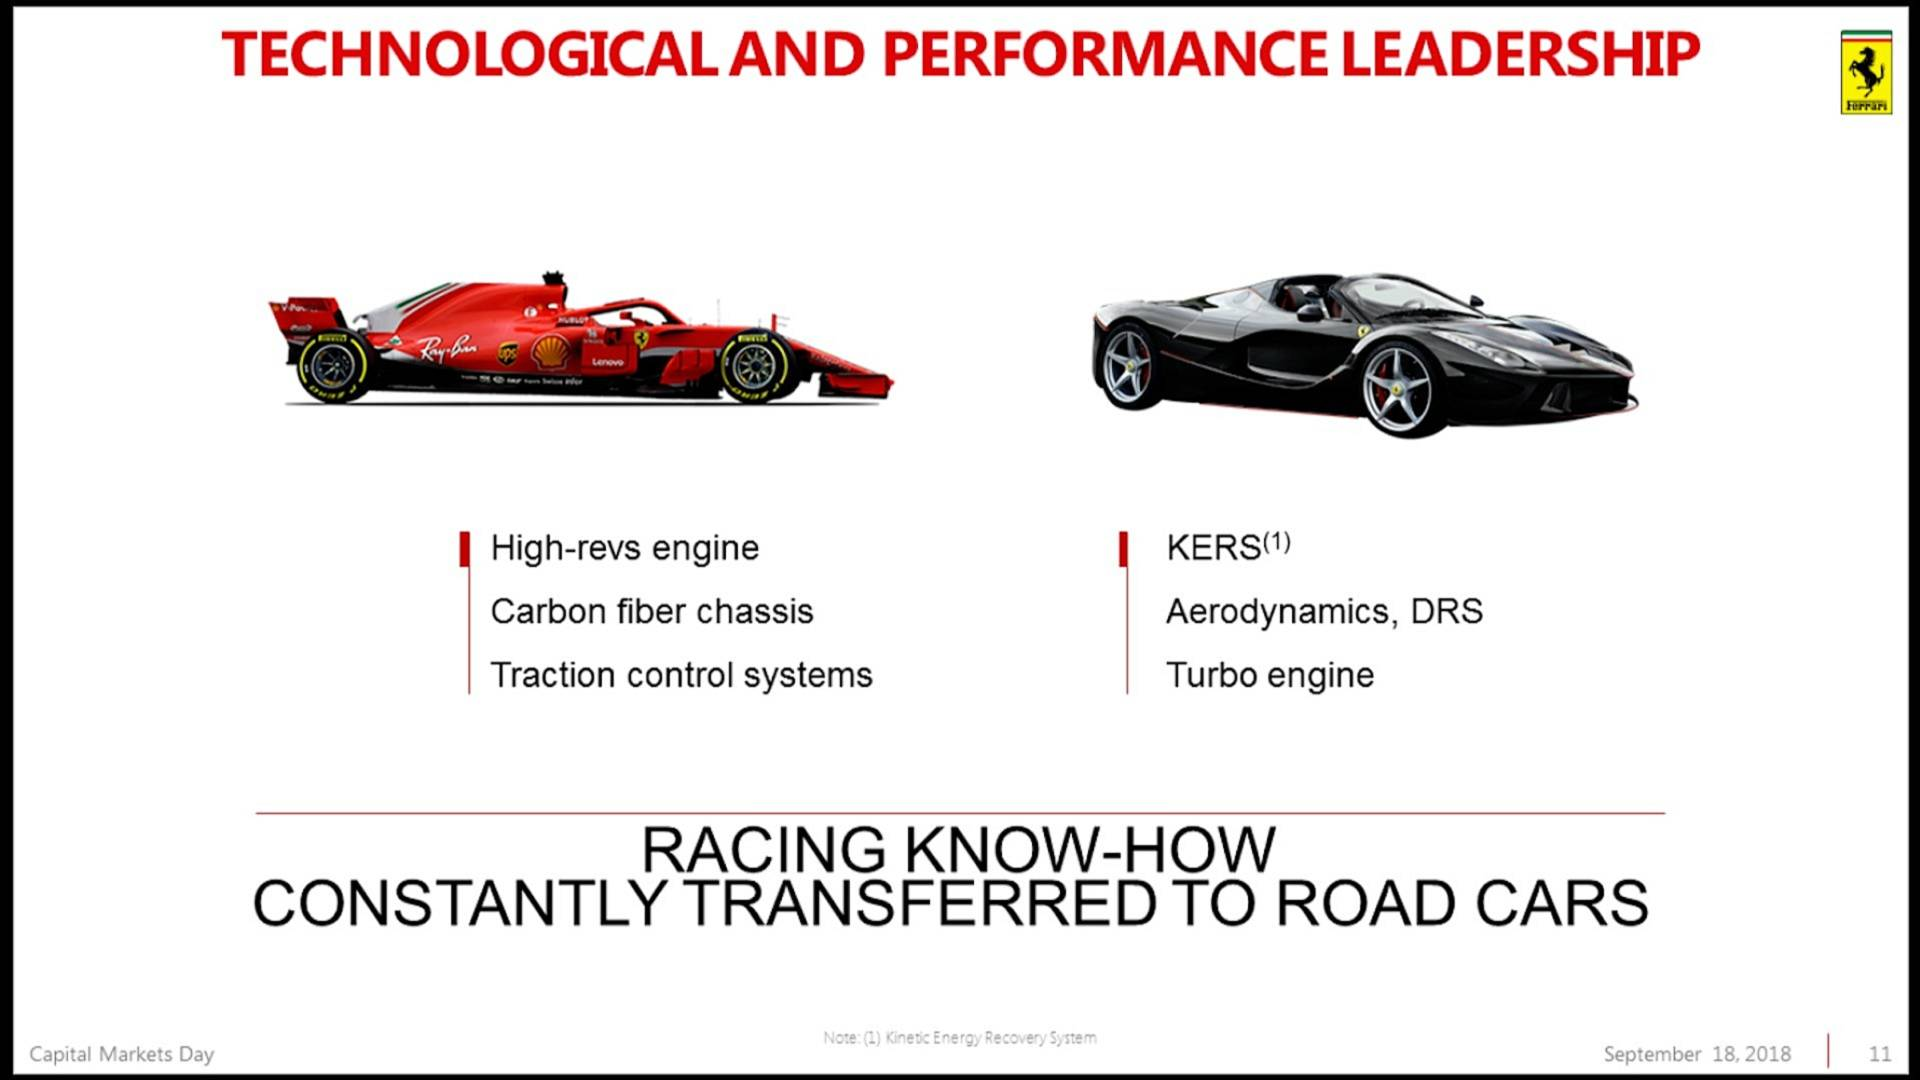 Piano Industriale Ferrari 2018-2022 (8)